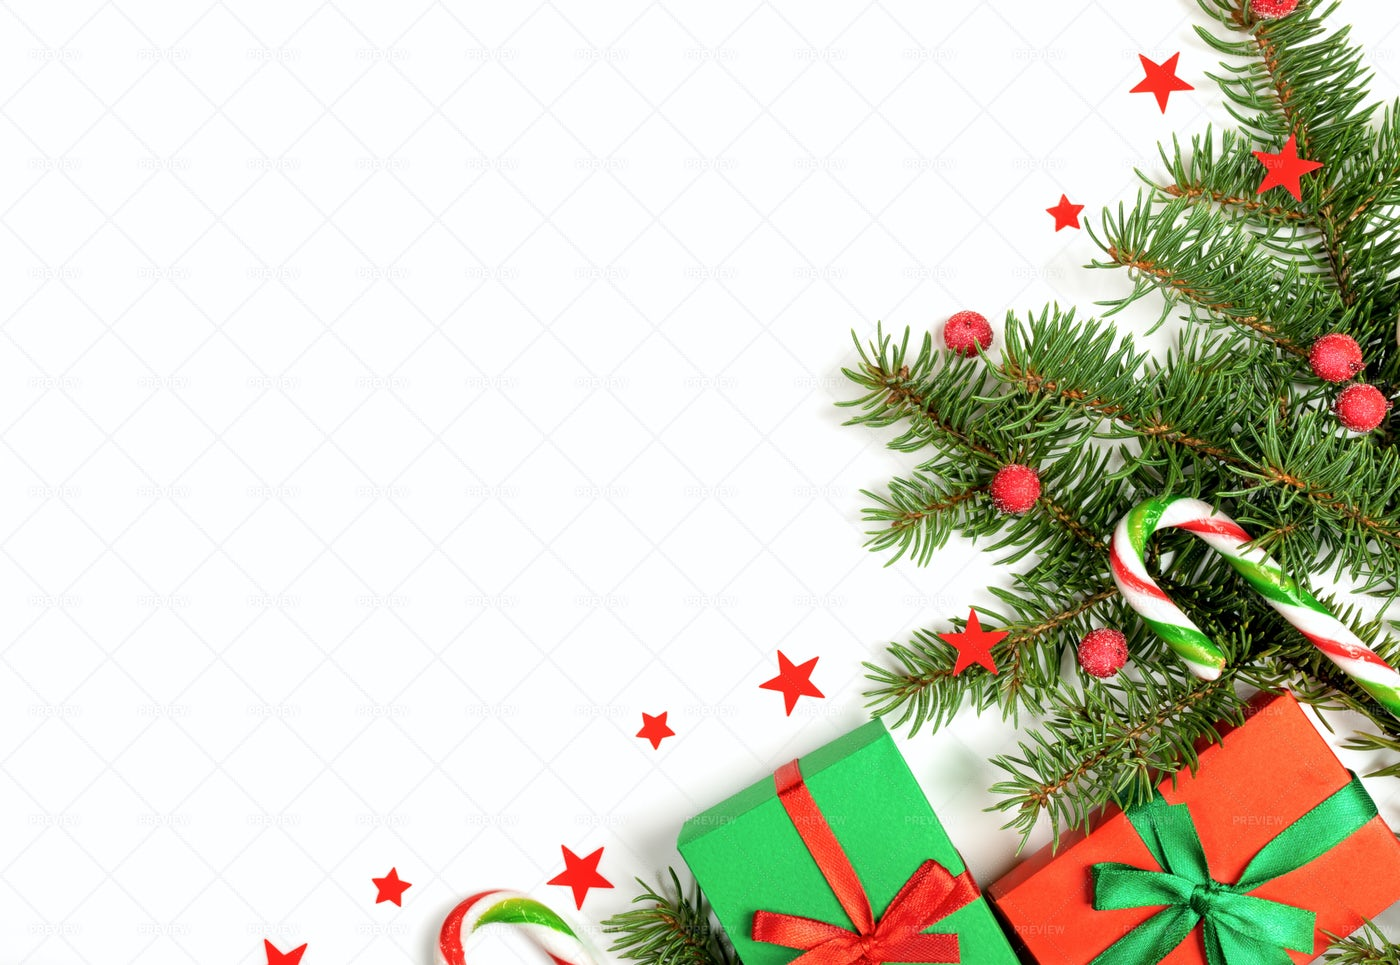 Christmas Composition On White.: Stock Photos